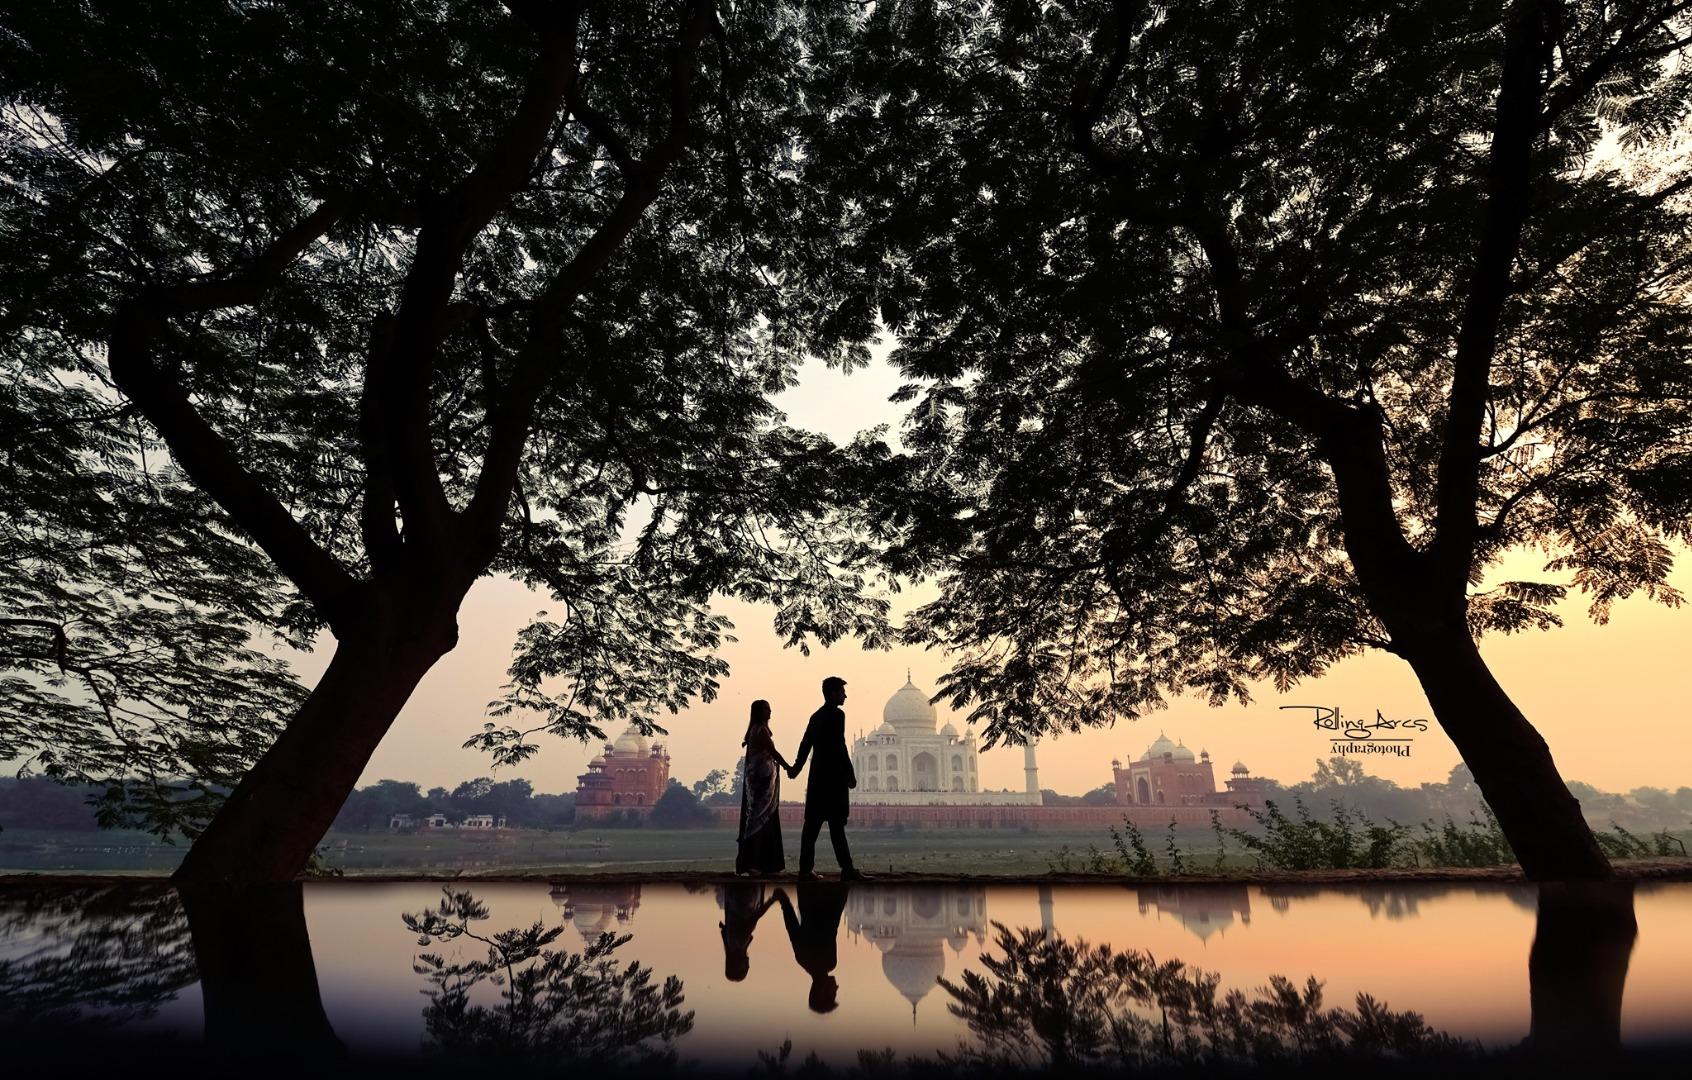 Couple Pre Wedding Shoot near Taj Mahal